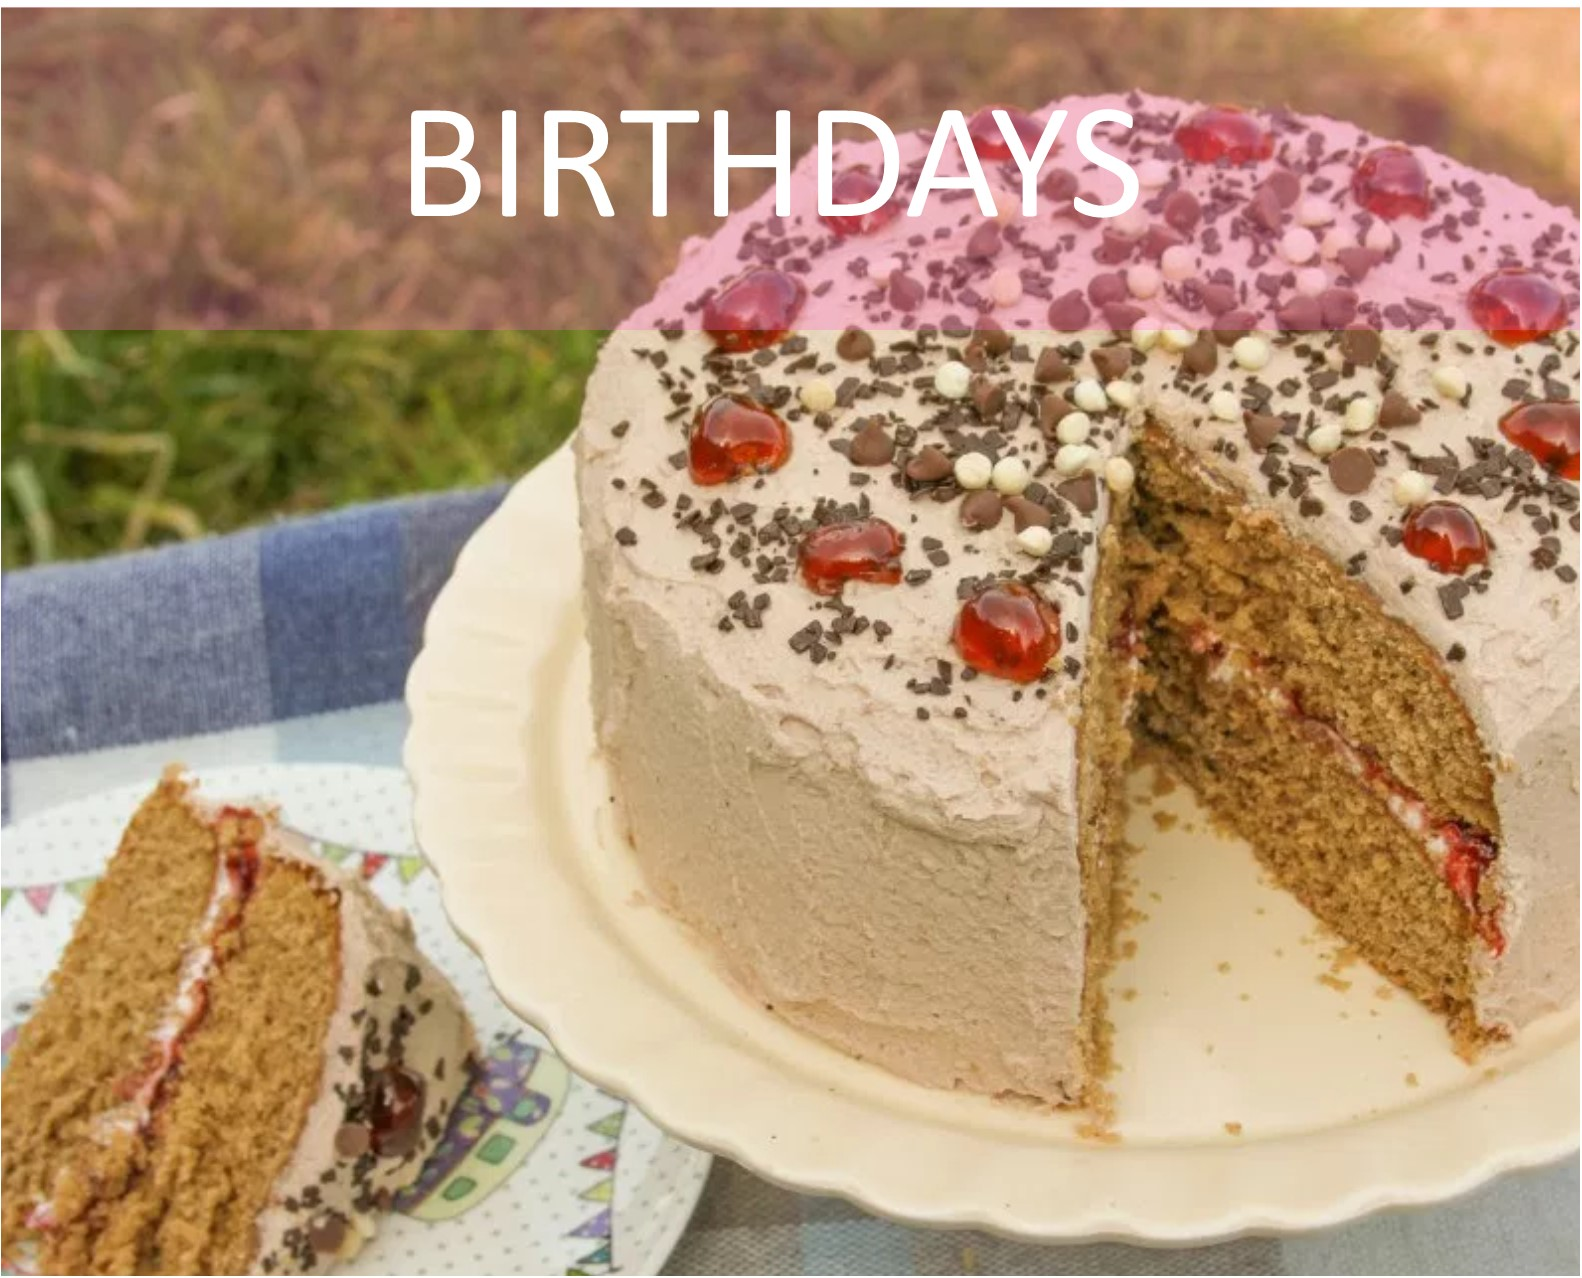 Party ideas & yummy cakes